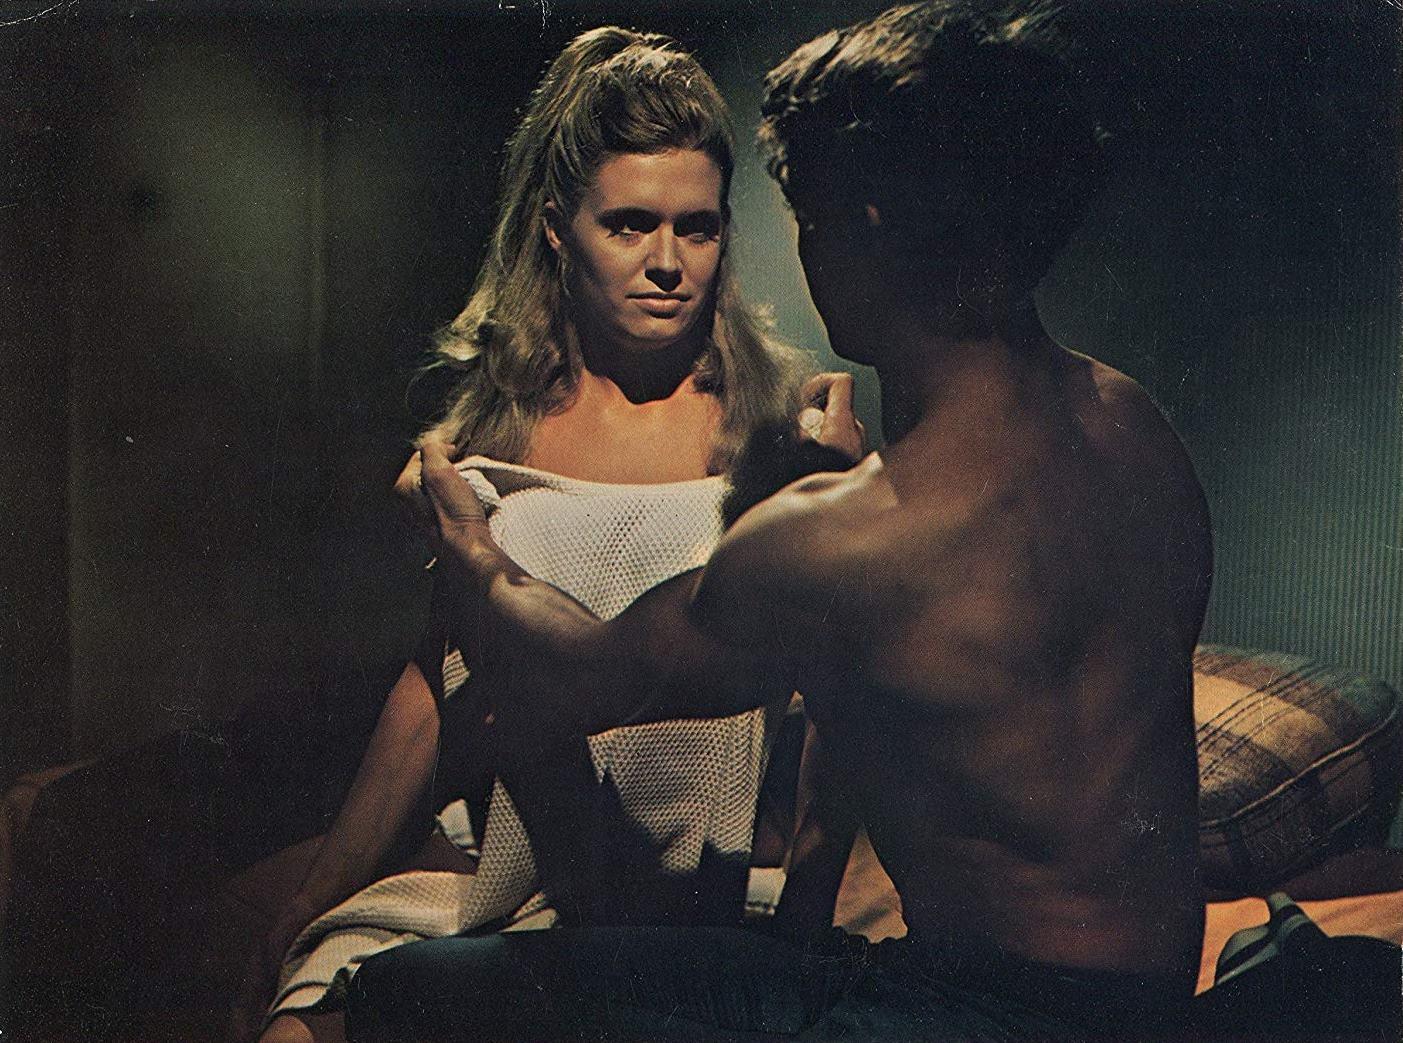 Carol White with her psychopathic boyfriend  Scott Hylands in Daddy's Gone A-Hunting (1969)